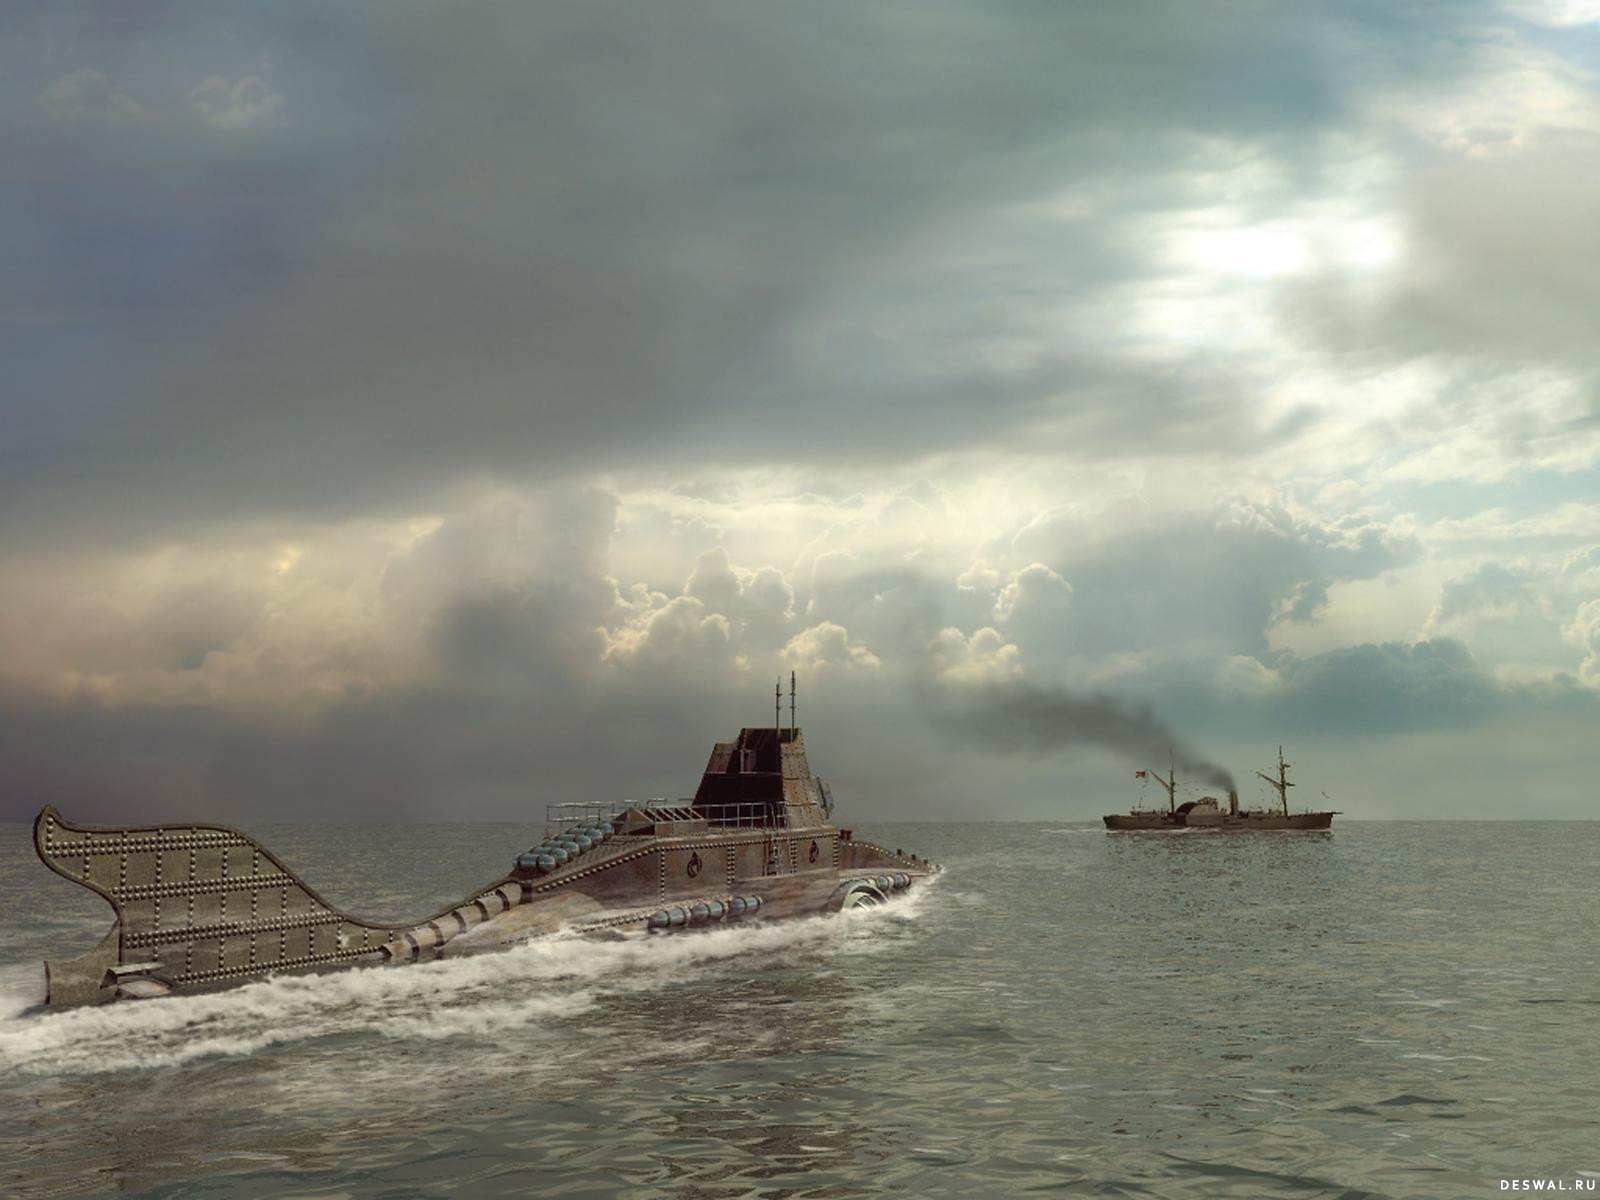 Подлодка «Наутилус» капитана Немо